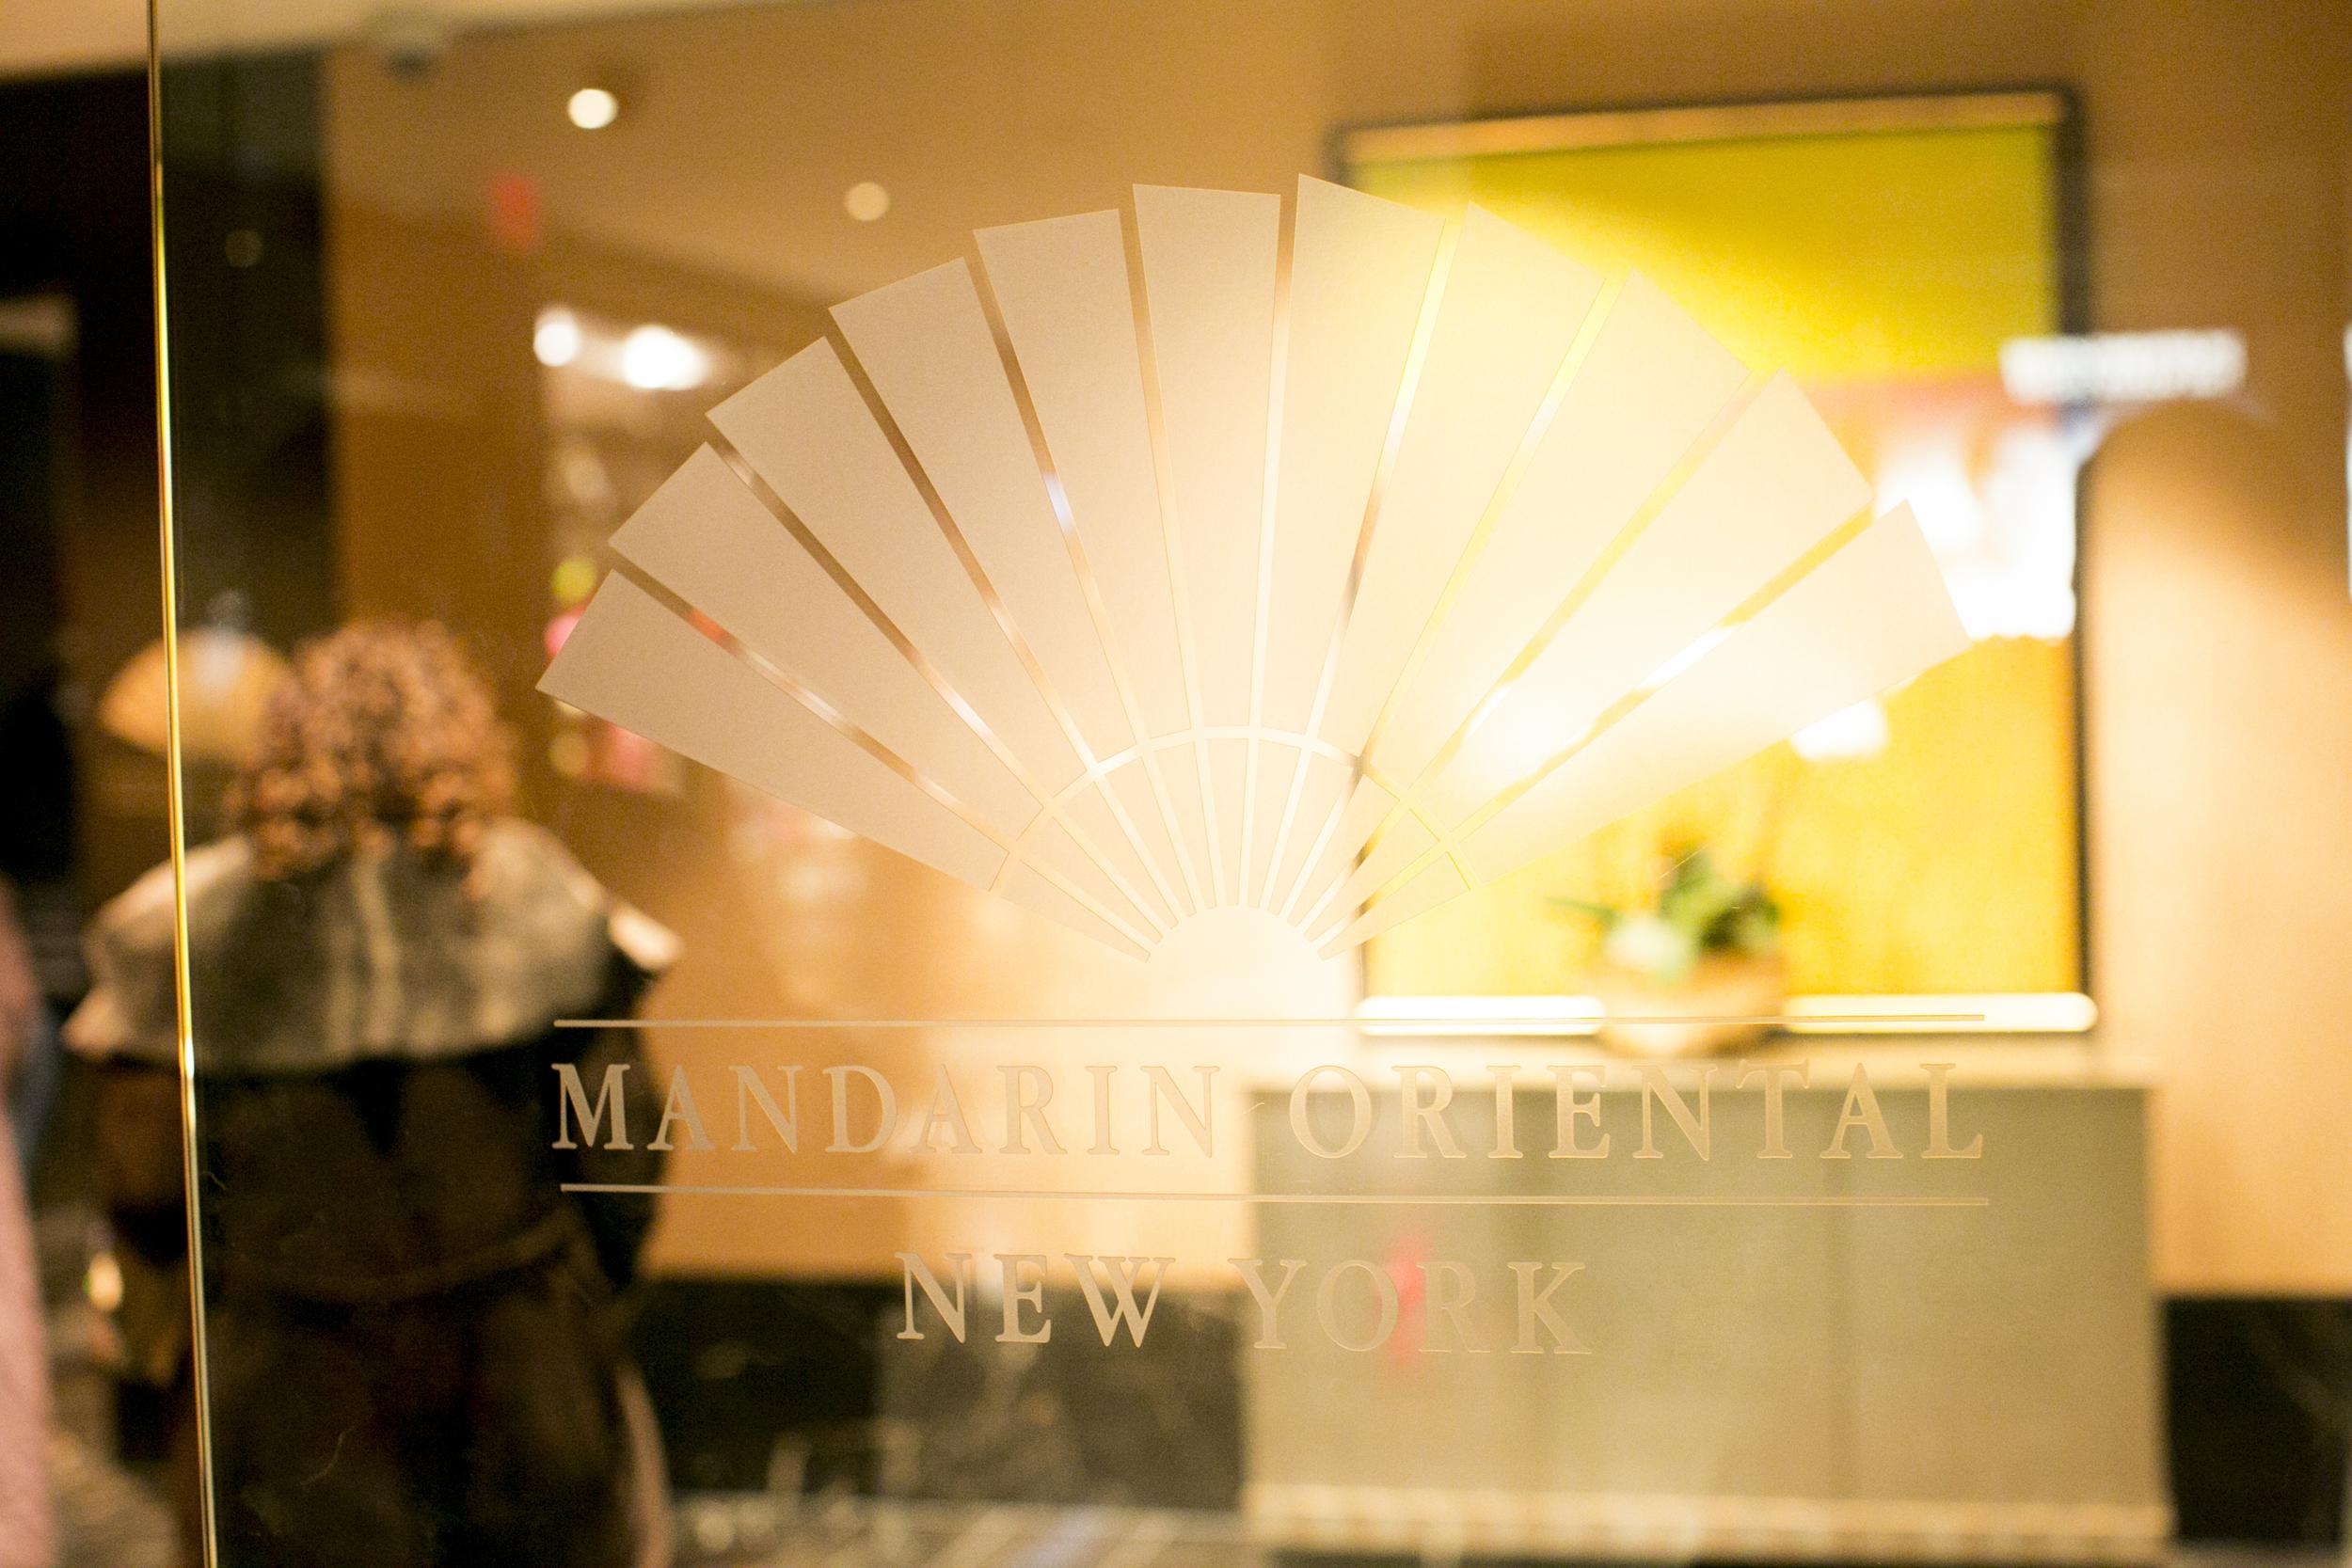 NYC-Wedding-Planner-Andrea-Freeman-Events-Mandarin-Oriental-6.jpg